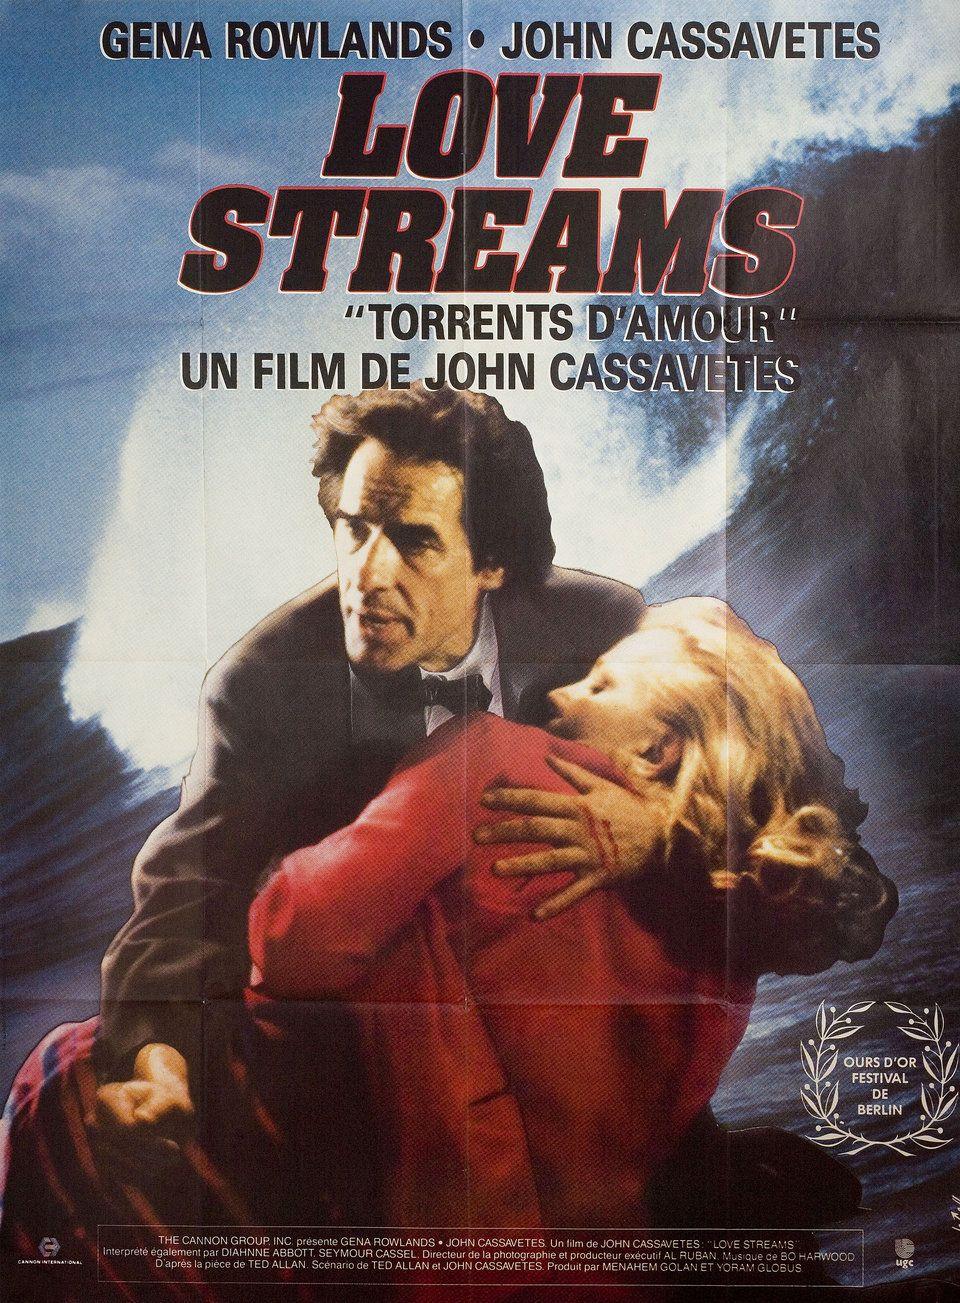 Love Streams 1984 French Grande Poster Posteritati Movie Poster Gallery New York Poster Movie Posters Movies